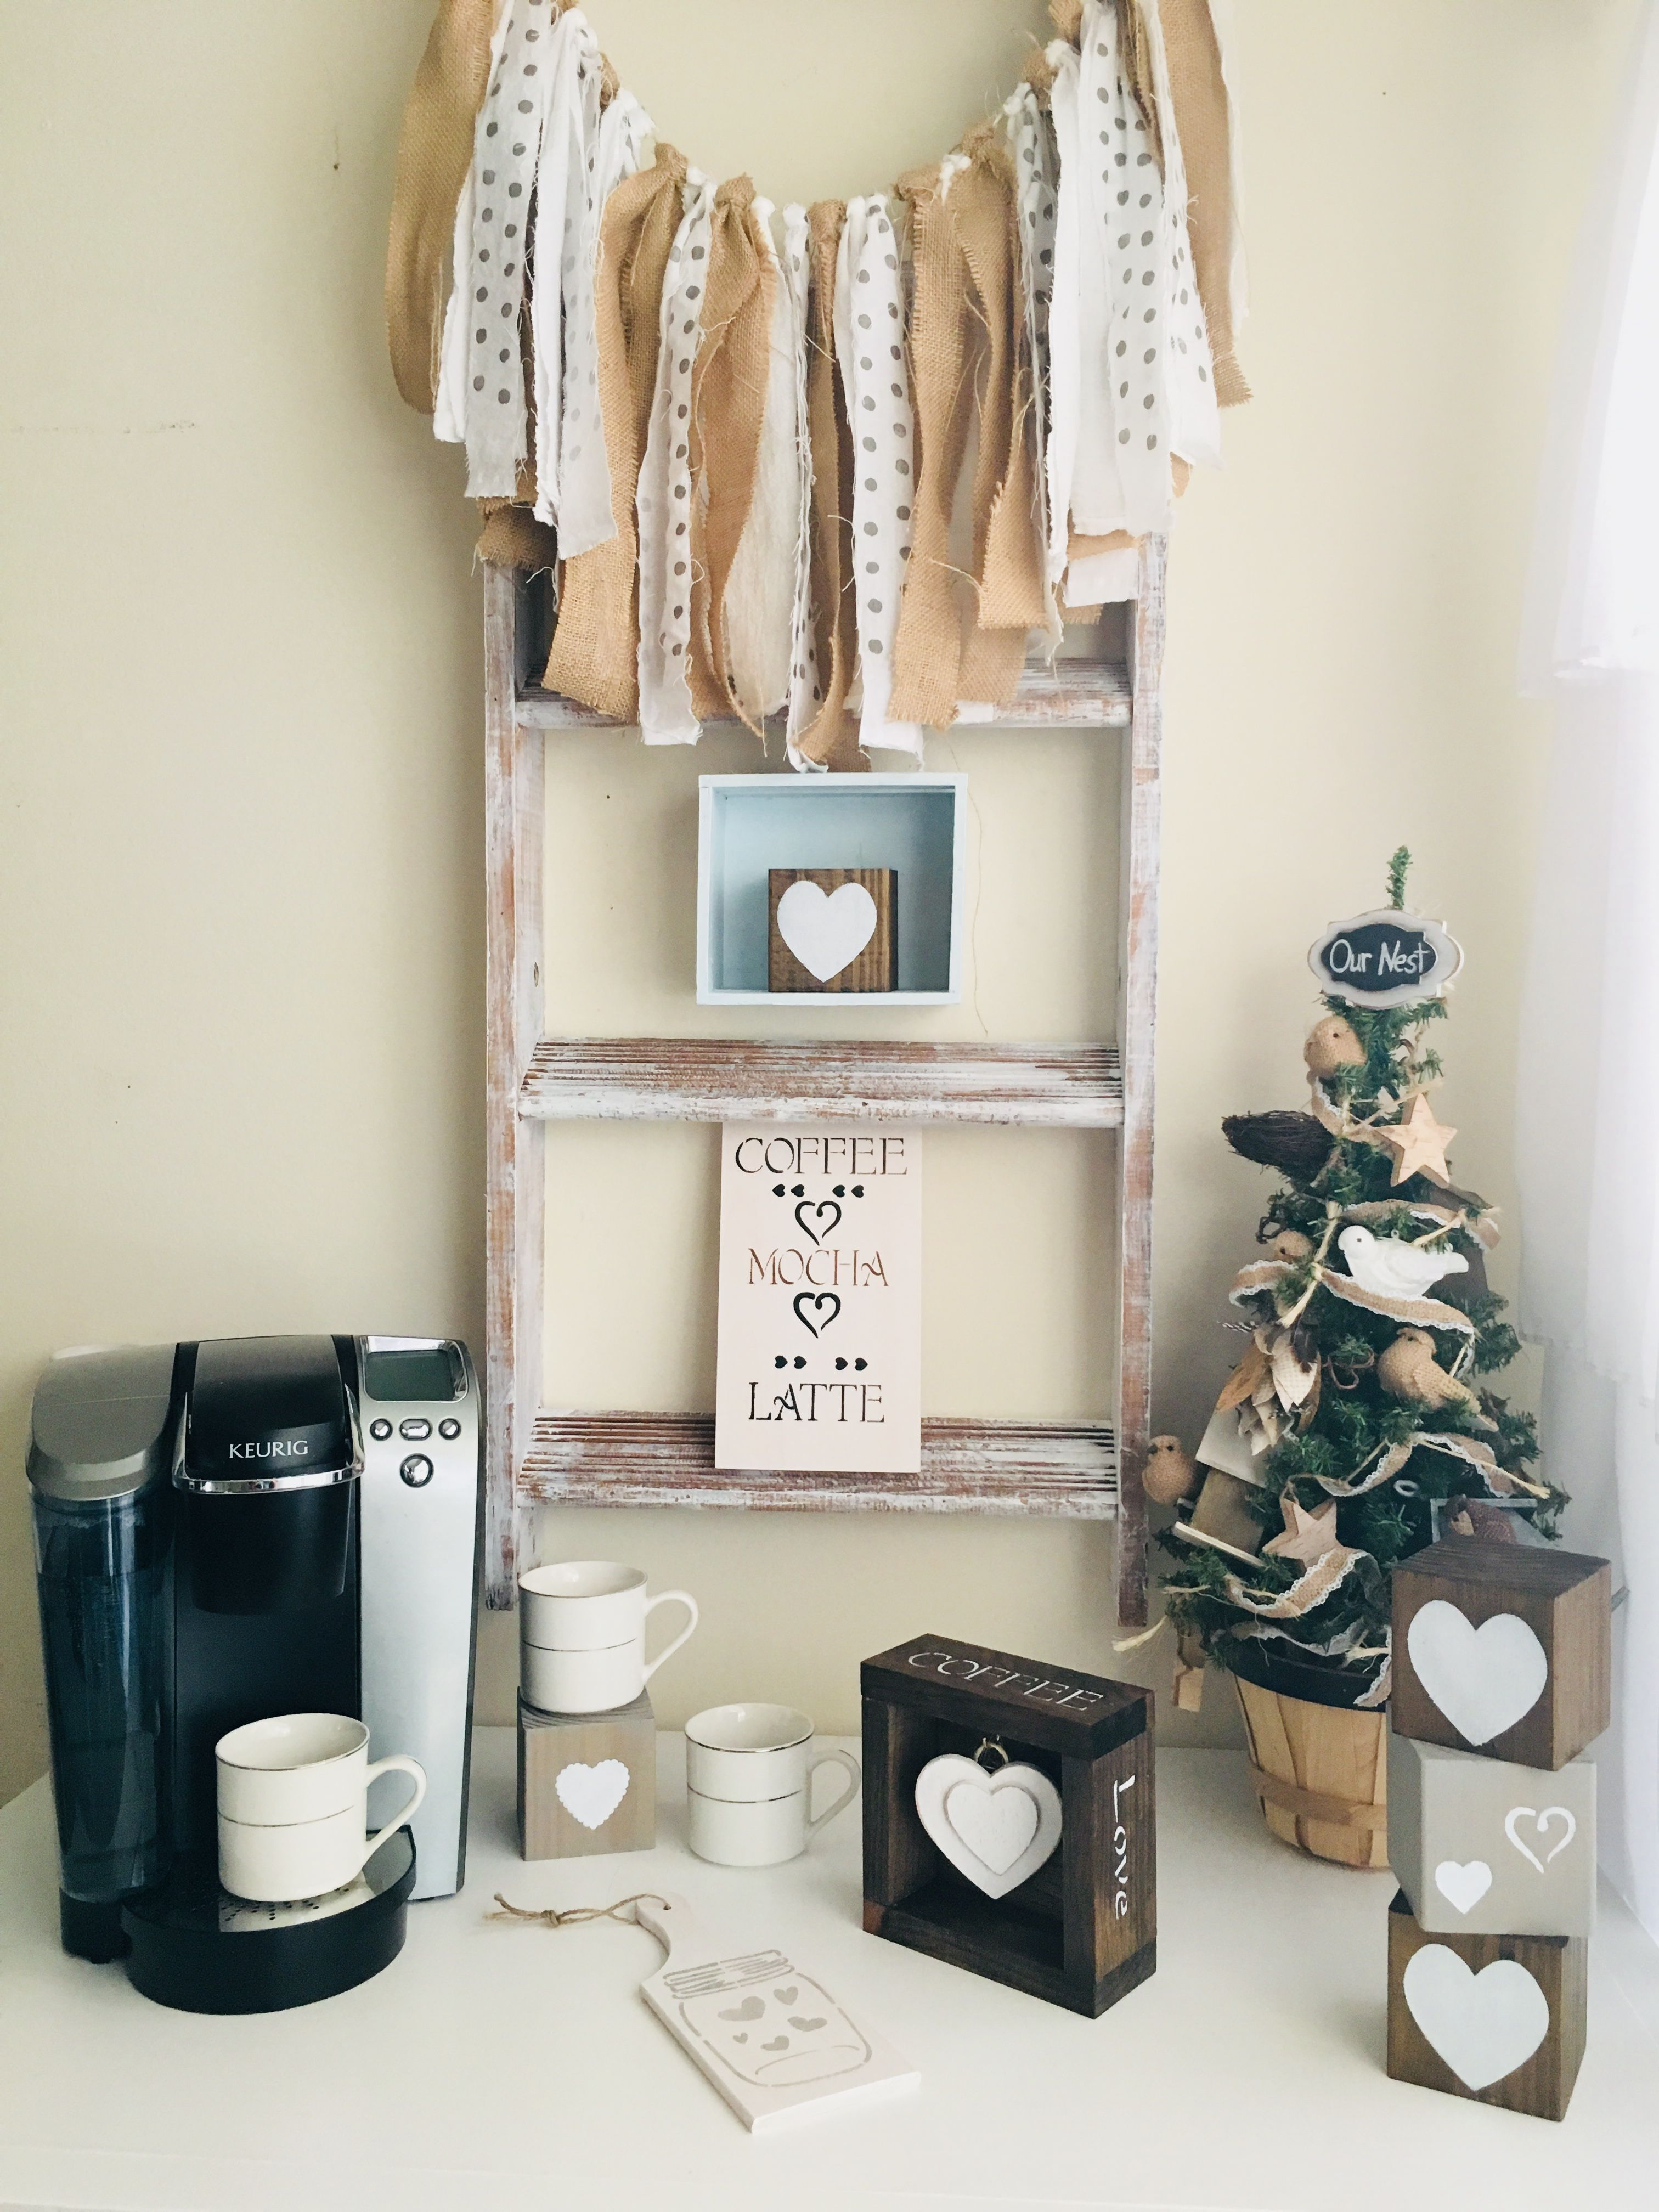 Farmhouse Coffee Bar Decor Shop Our Newest Items Furniture House